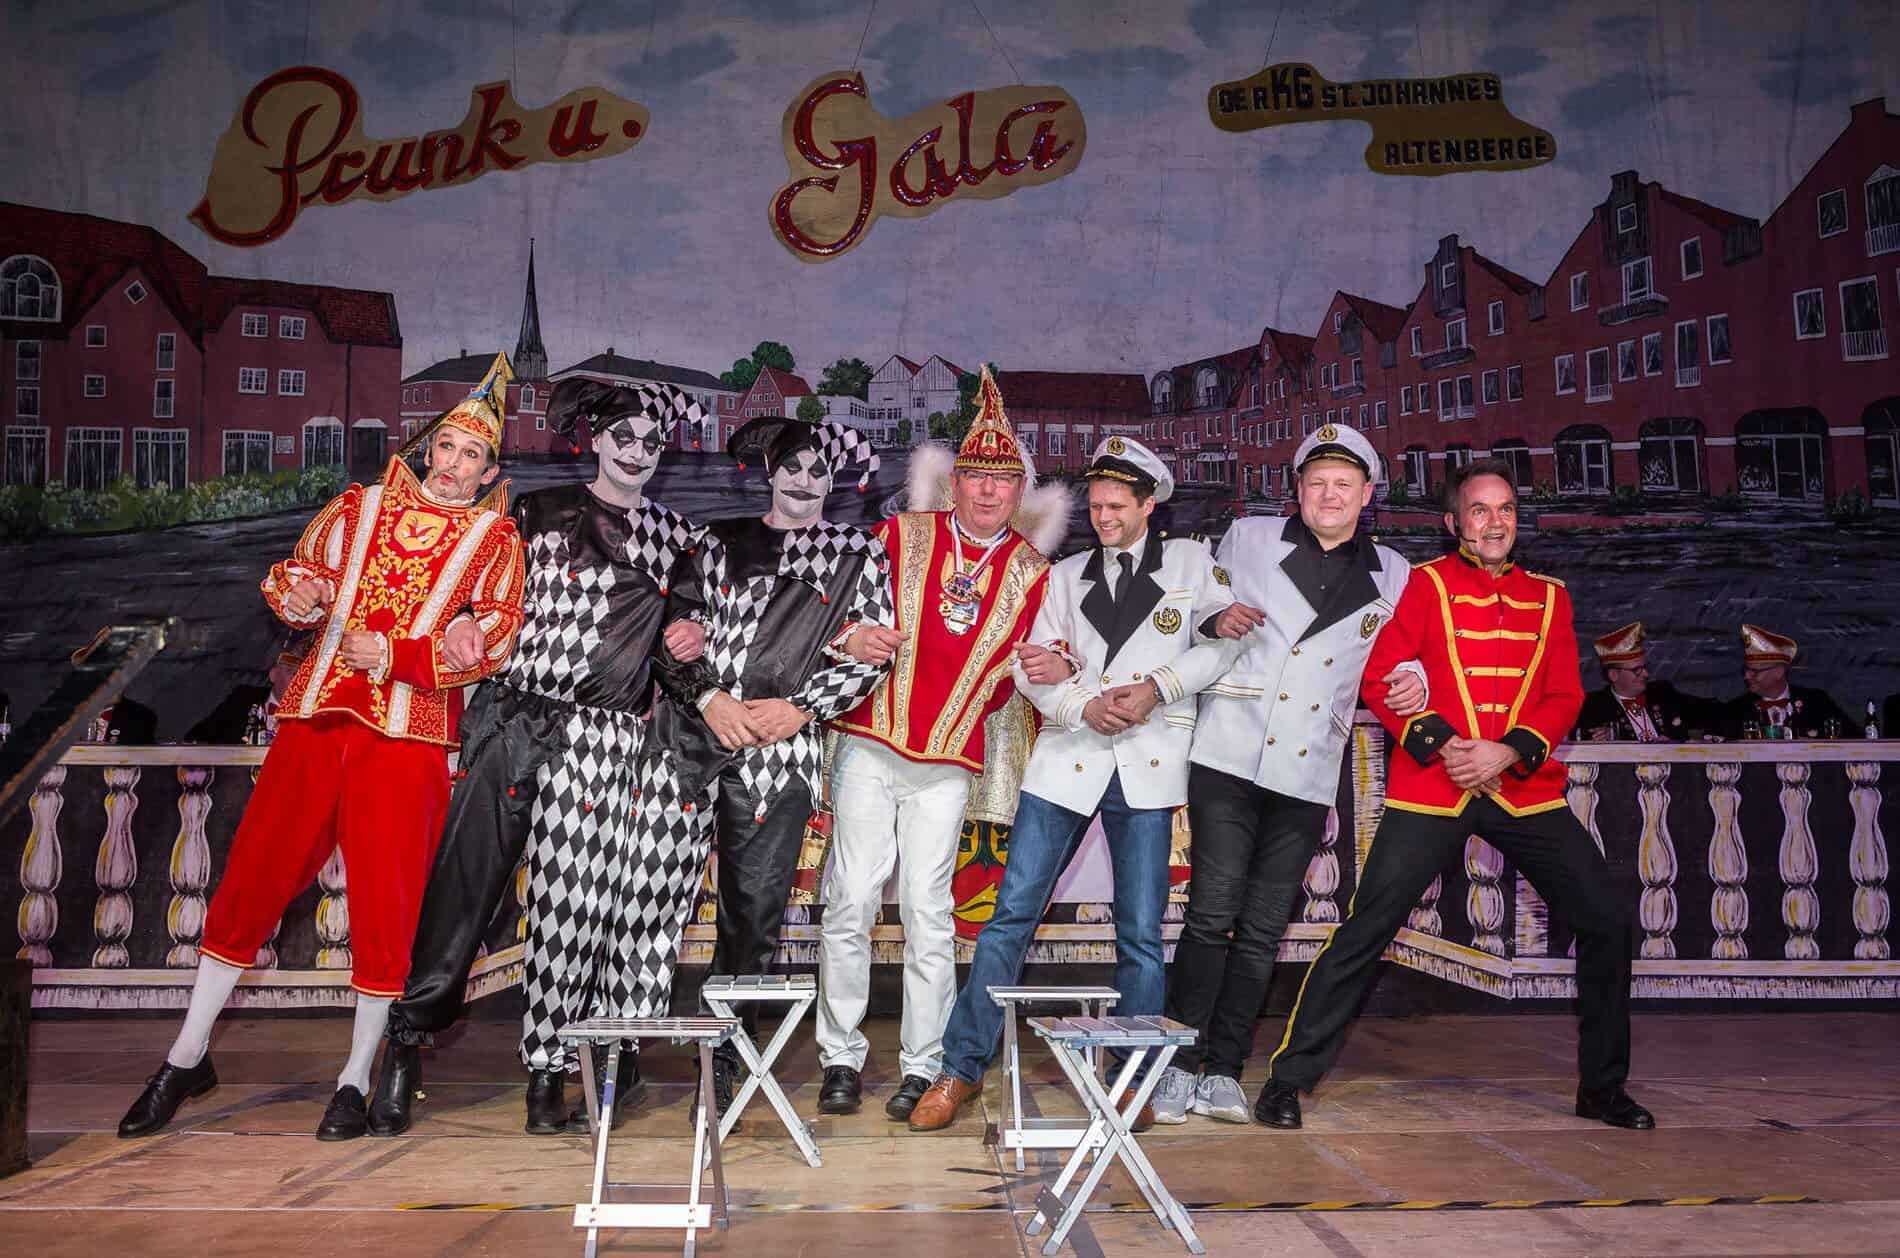 chapeau-bas-showpaket-karneval-10